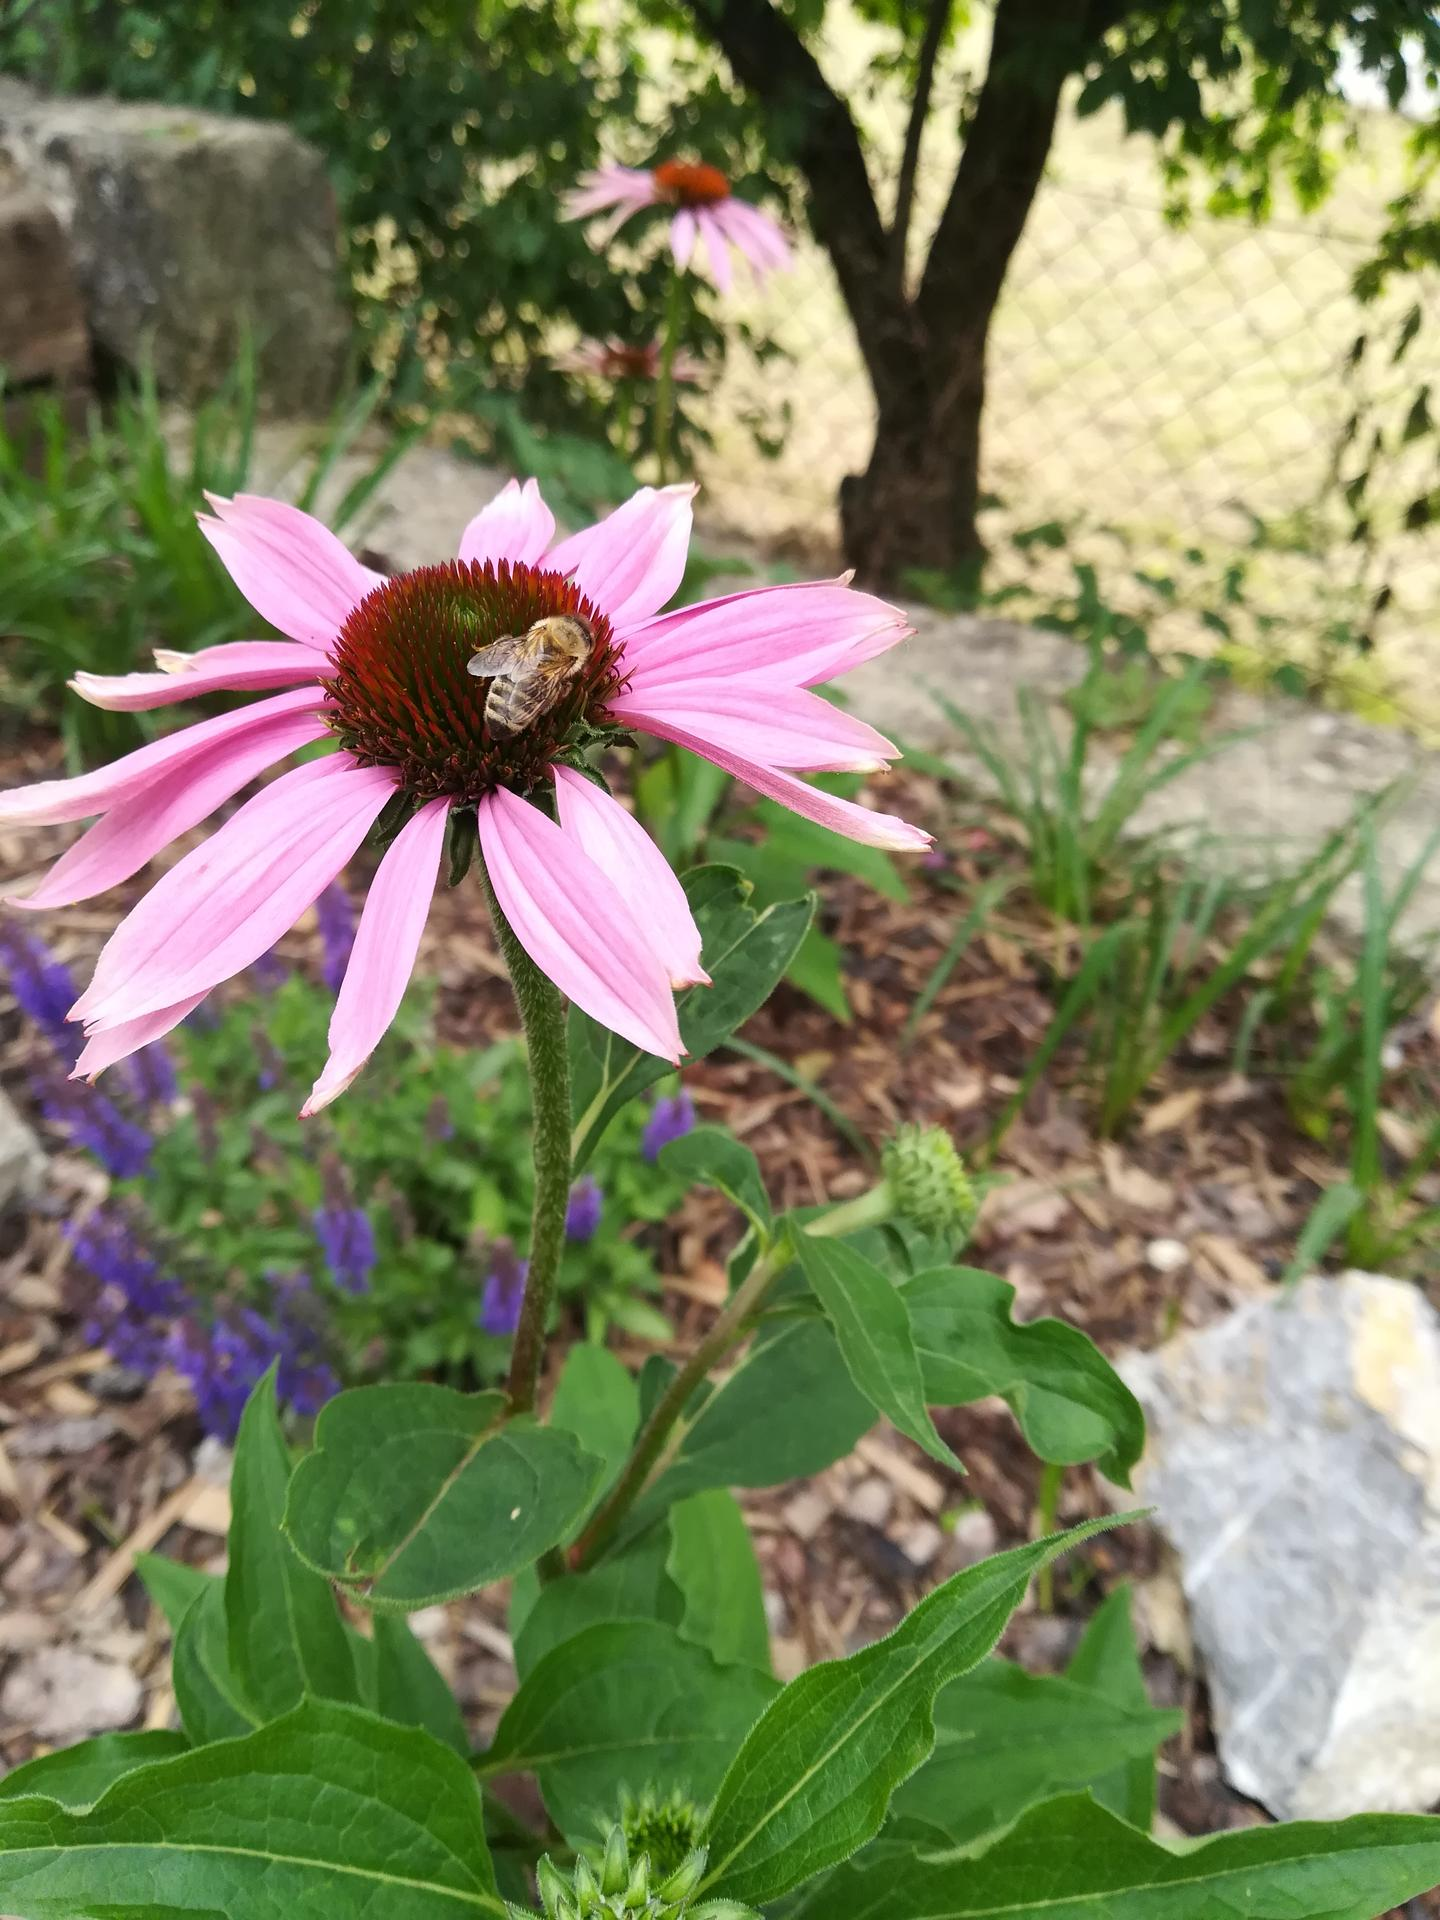 Žijeme vonku - Echinacea, ďalšia moja srdcovka 😍